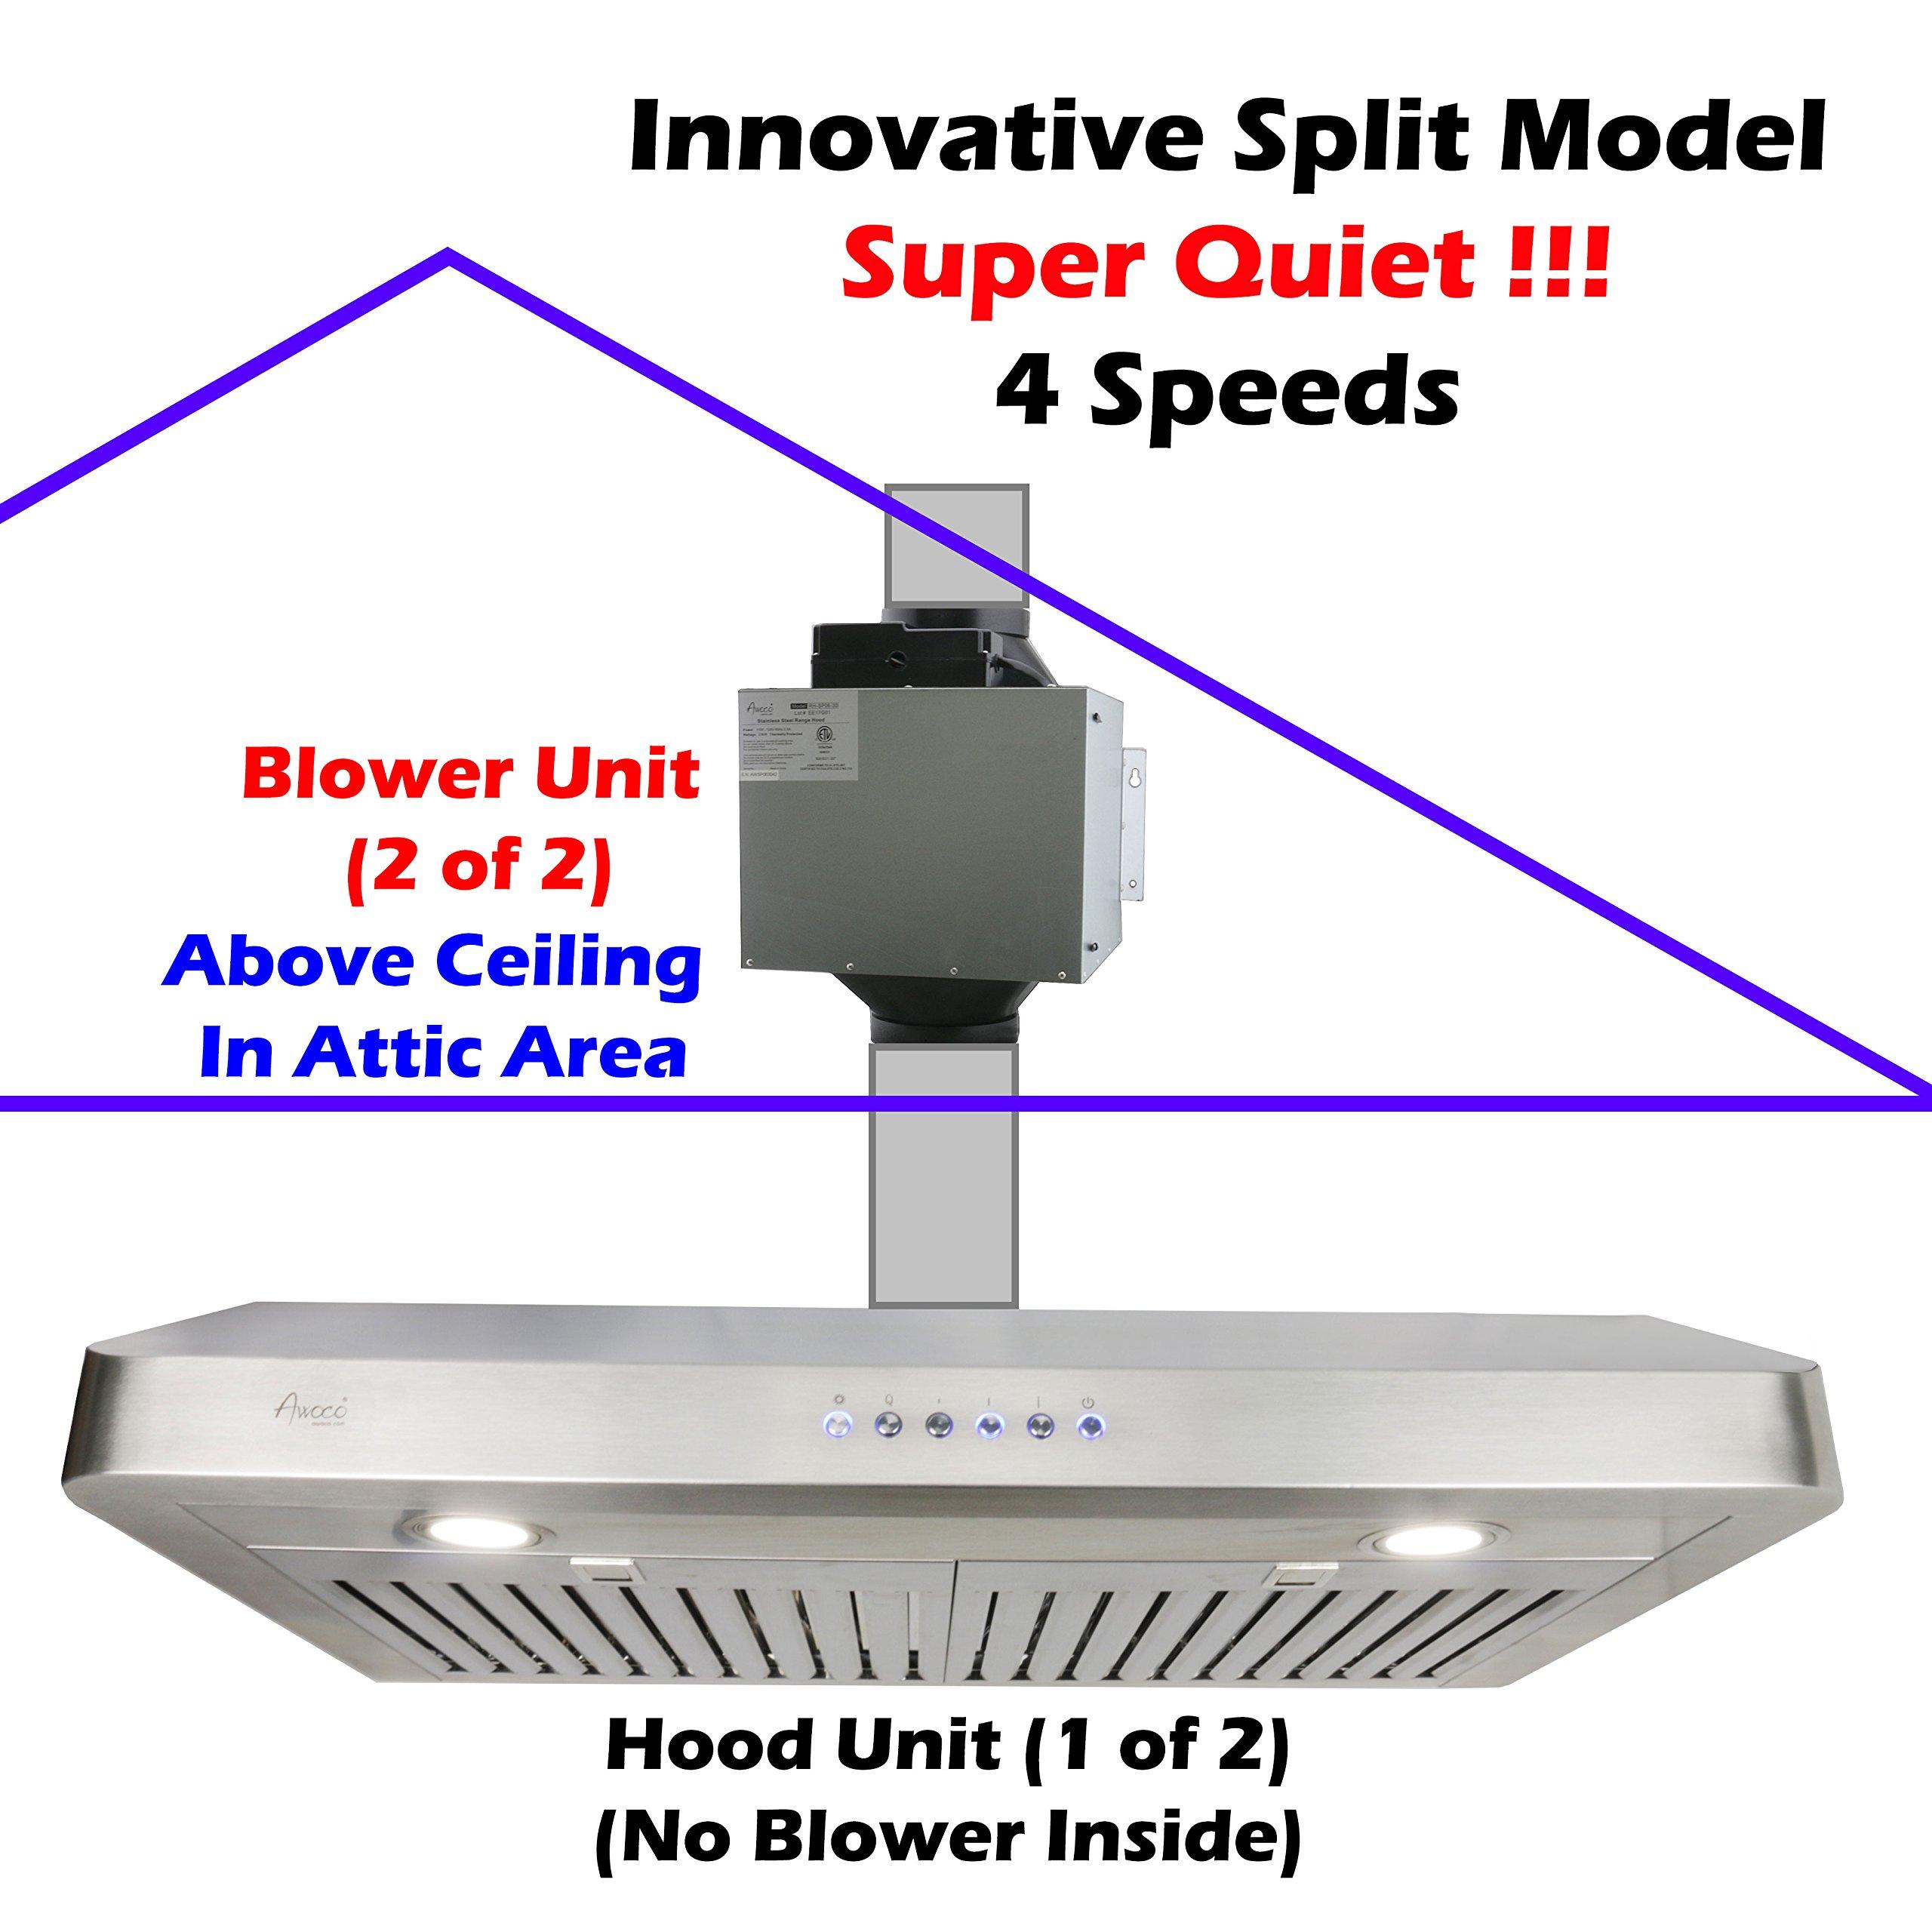 Buy Awoco Split Super Quiet Range Hood Inline Blower Unit